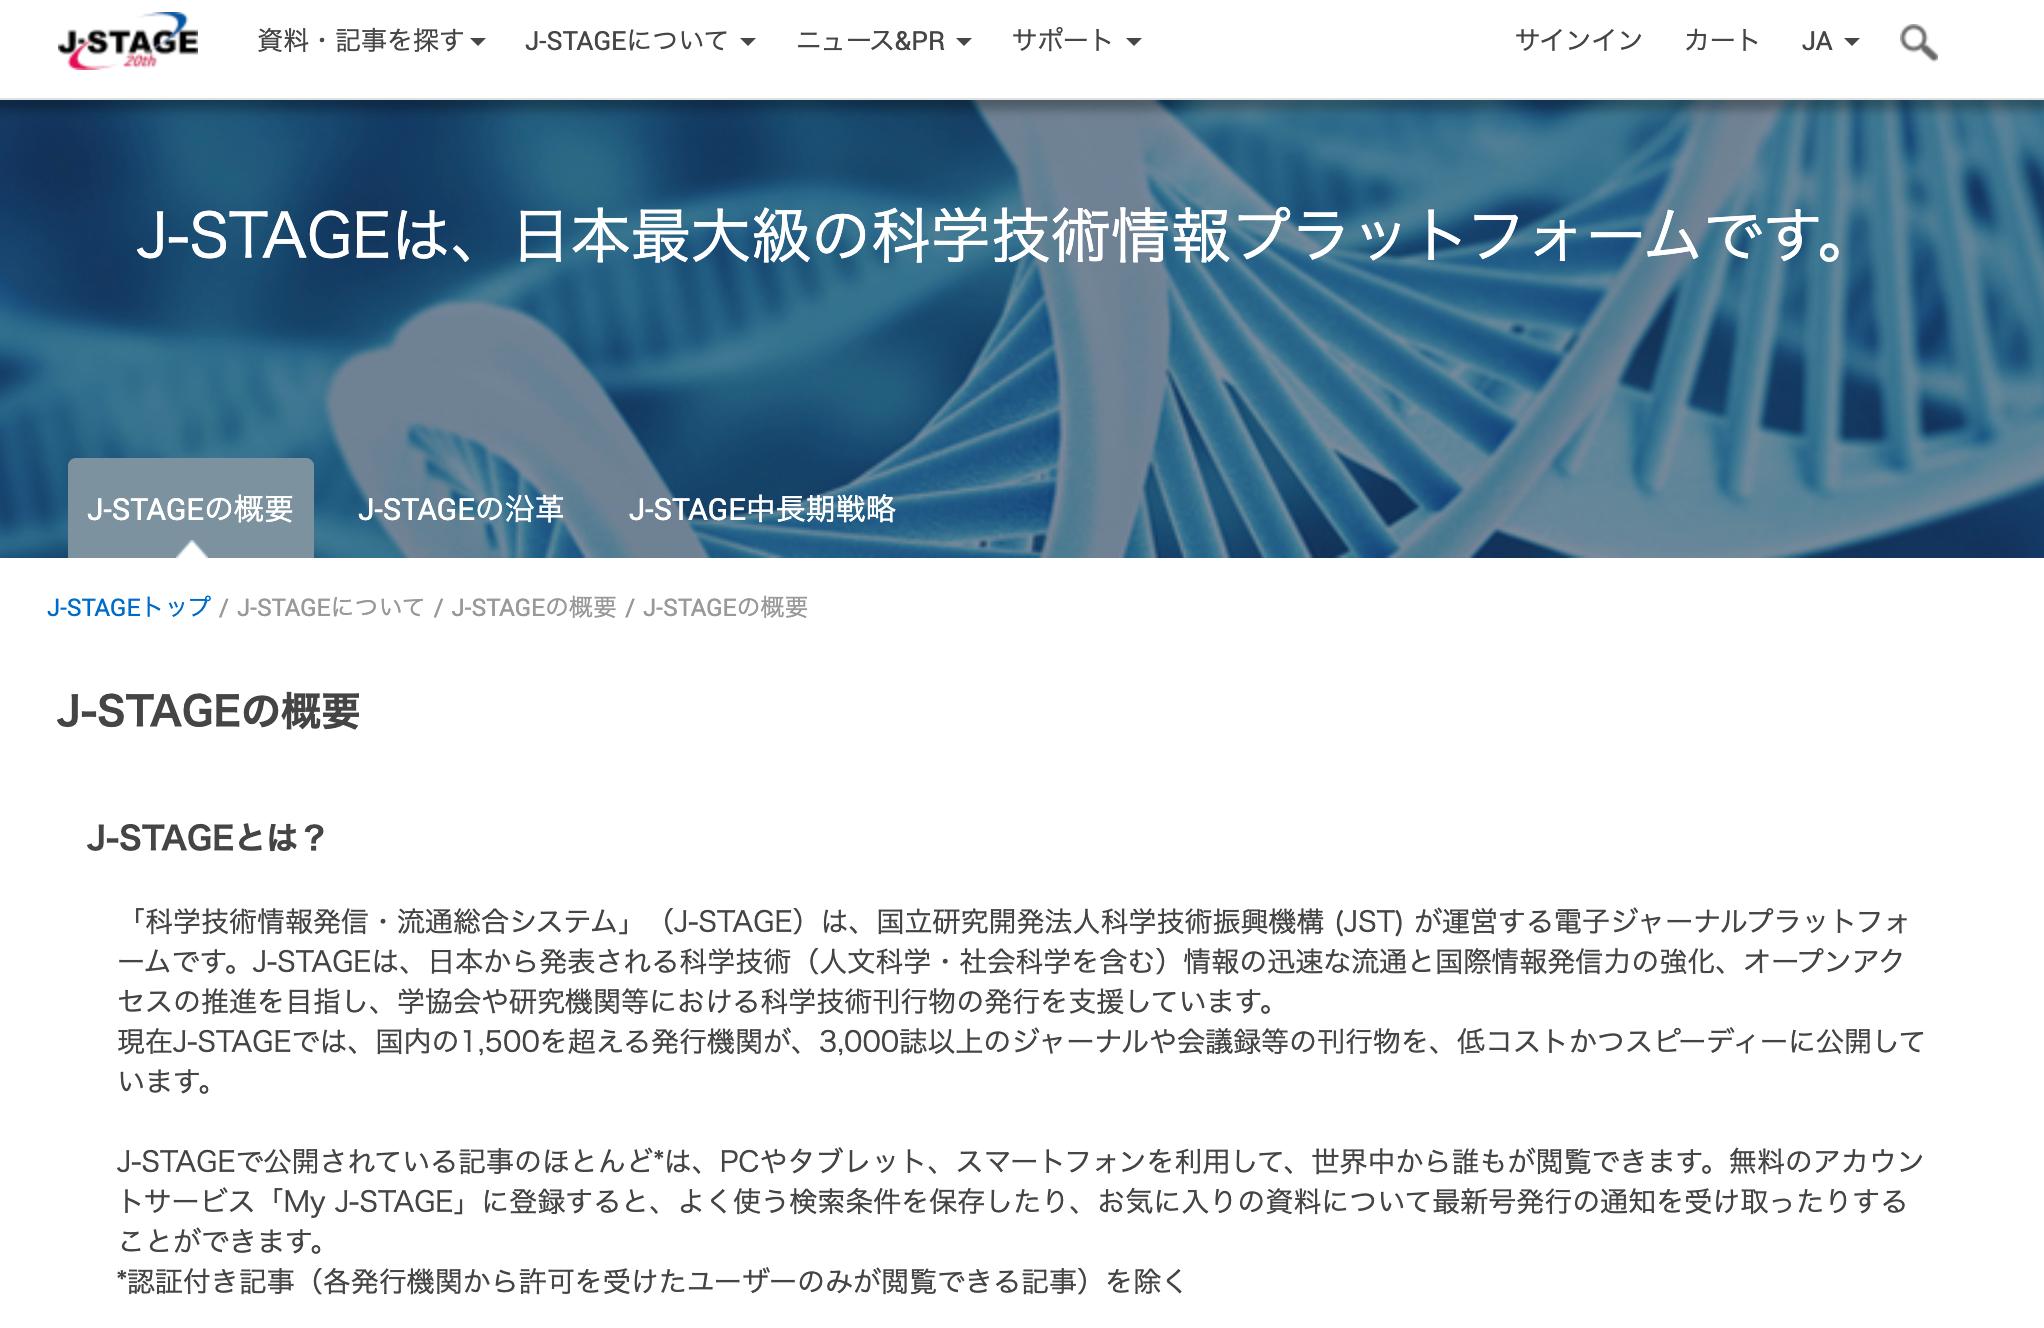 J−STAGE(科学技術情報発信・流通総合システム)